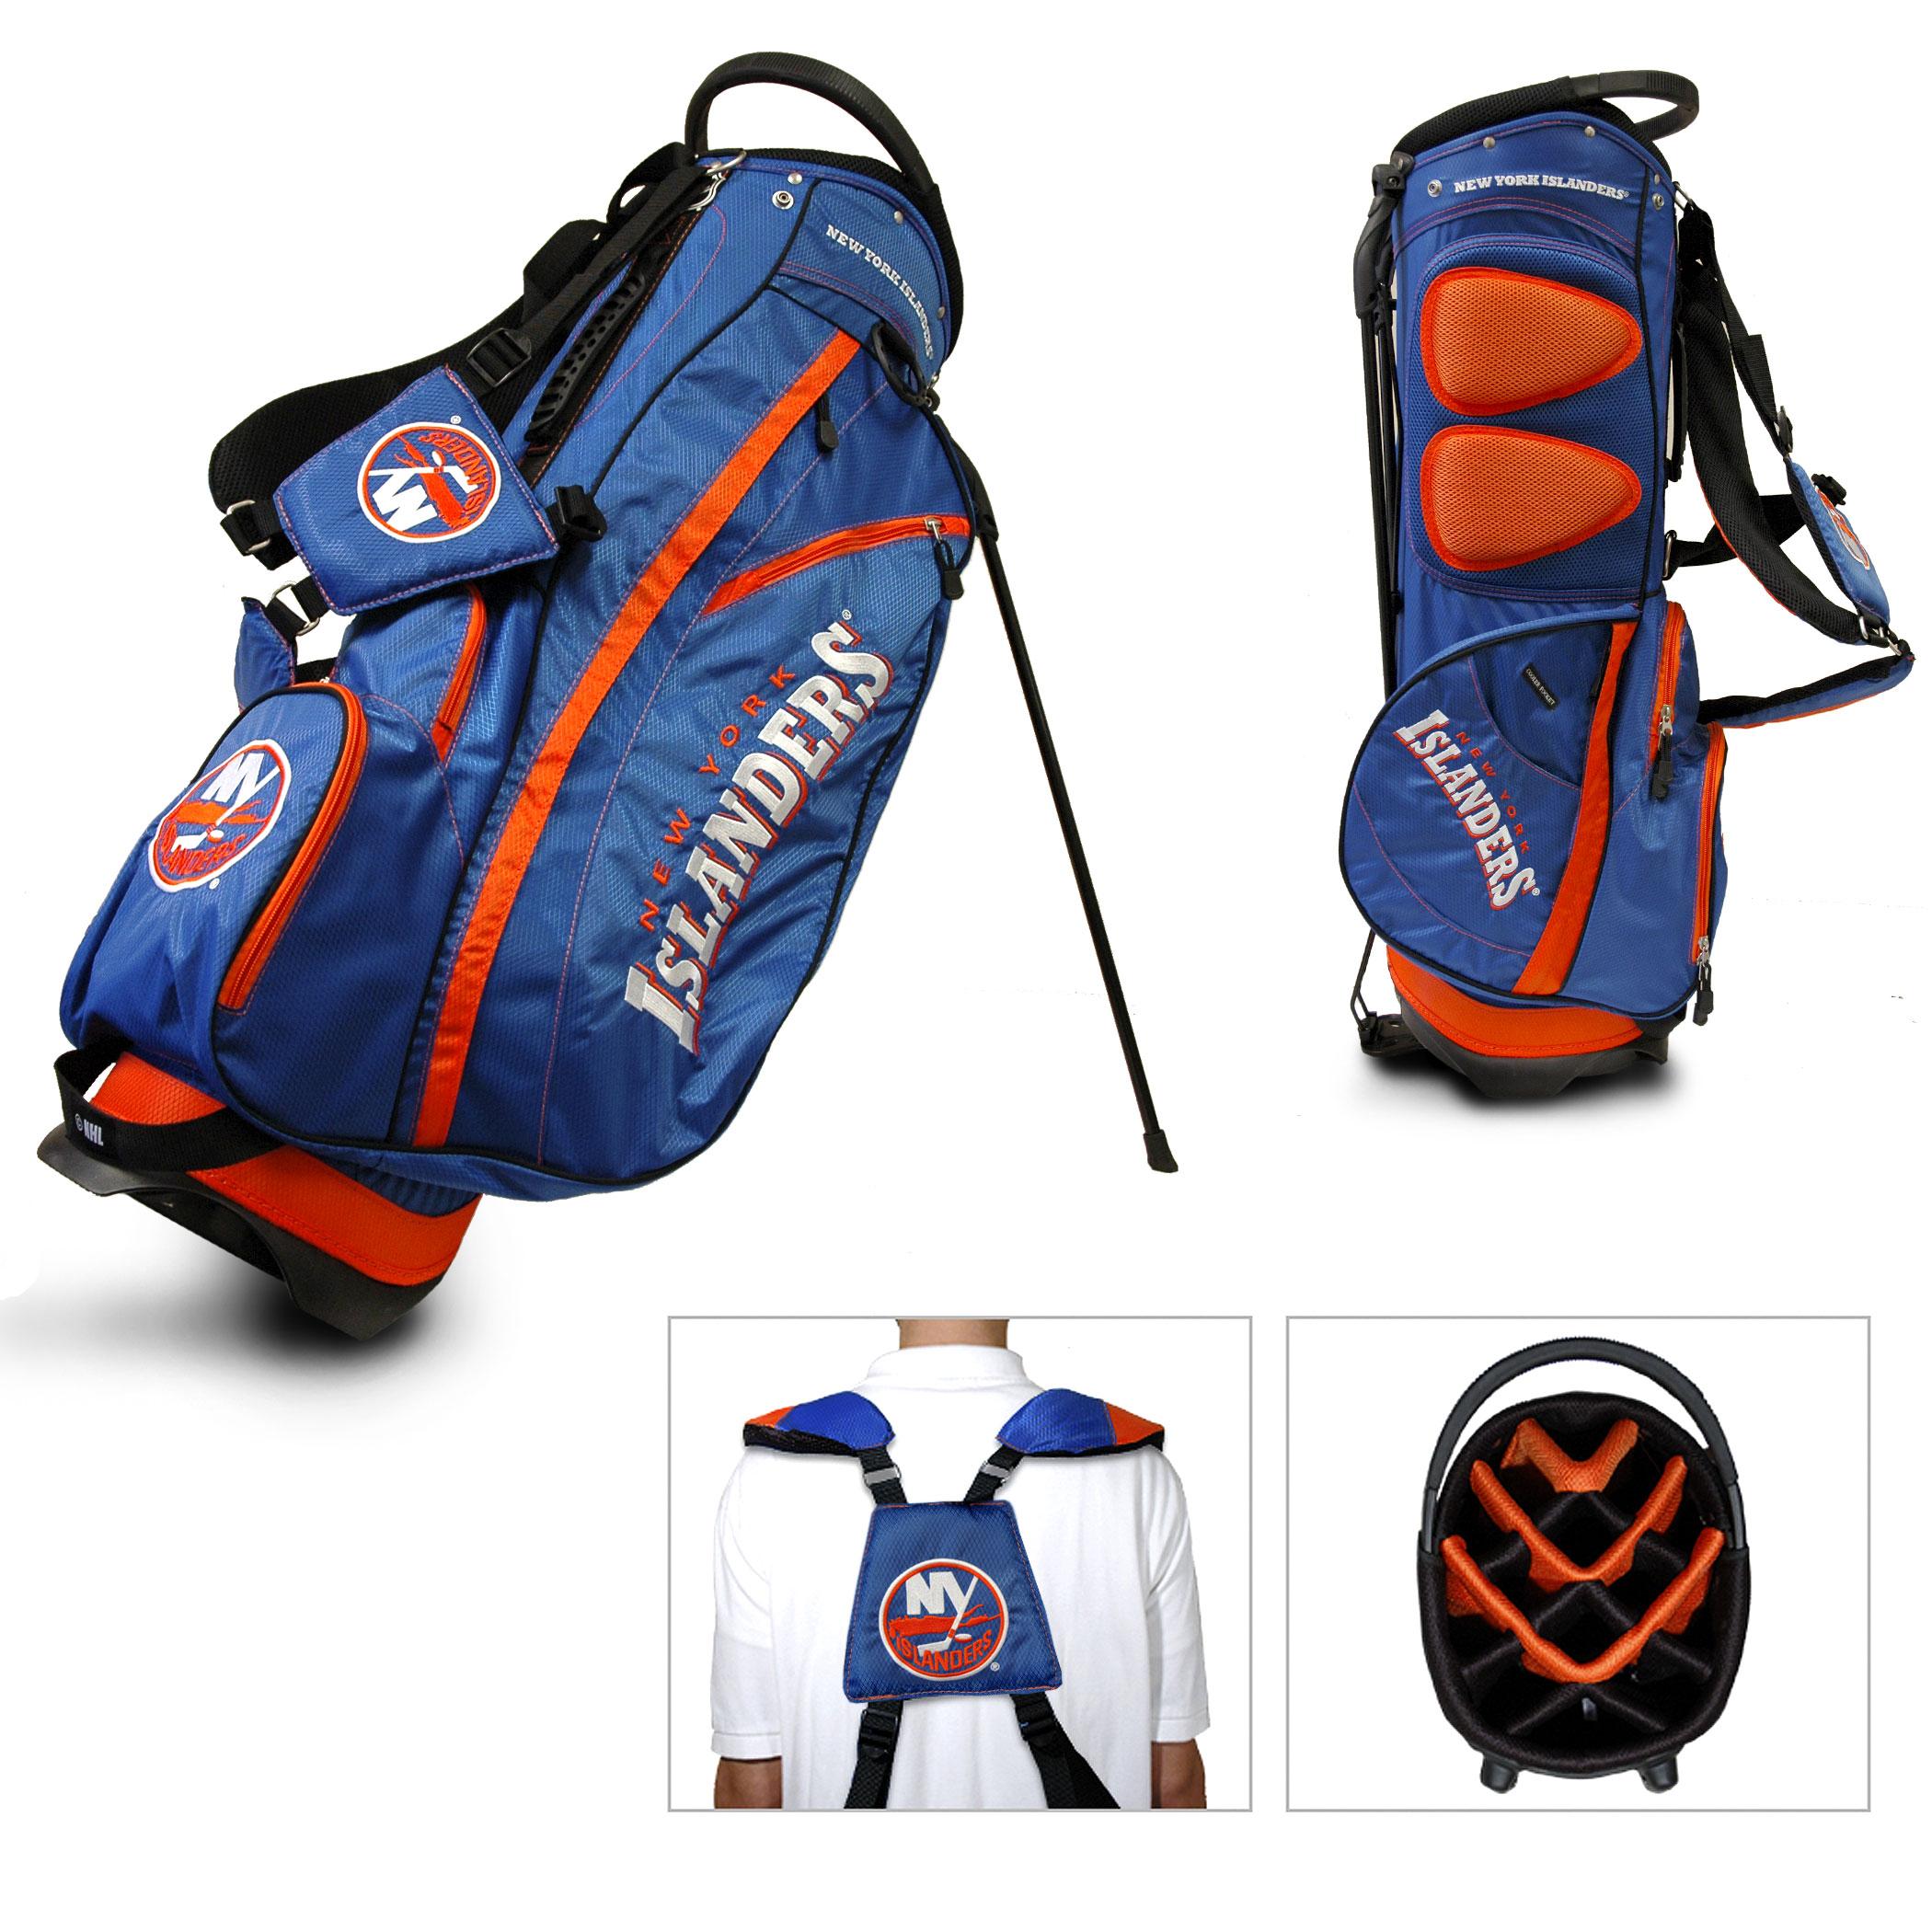 New York Islanders Team Golf Fairway Lightweight 14-Way Top Golf Club Stand Bag by